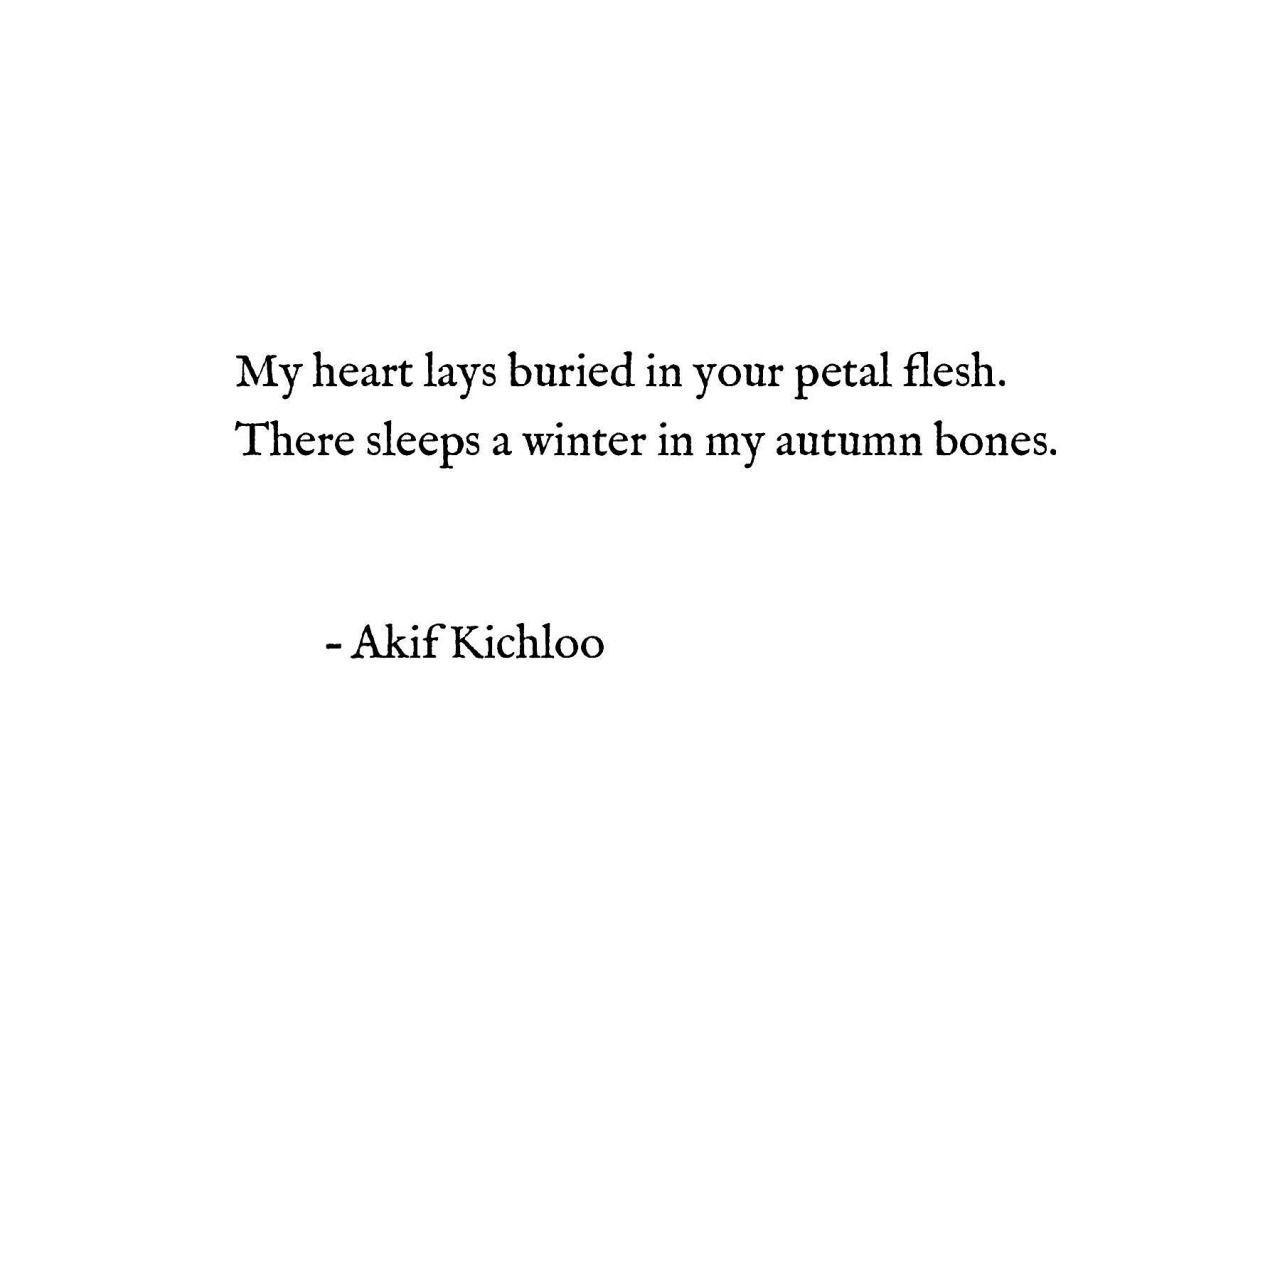 Akif Kichloo